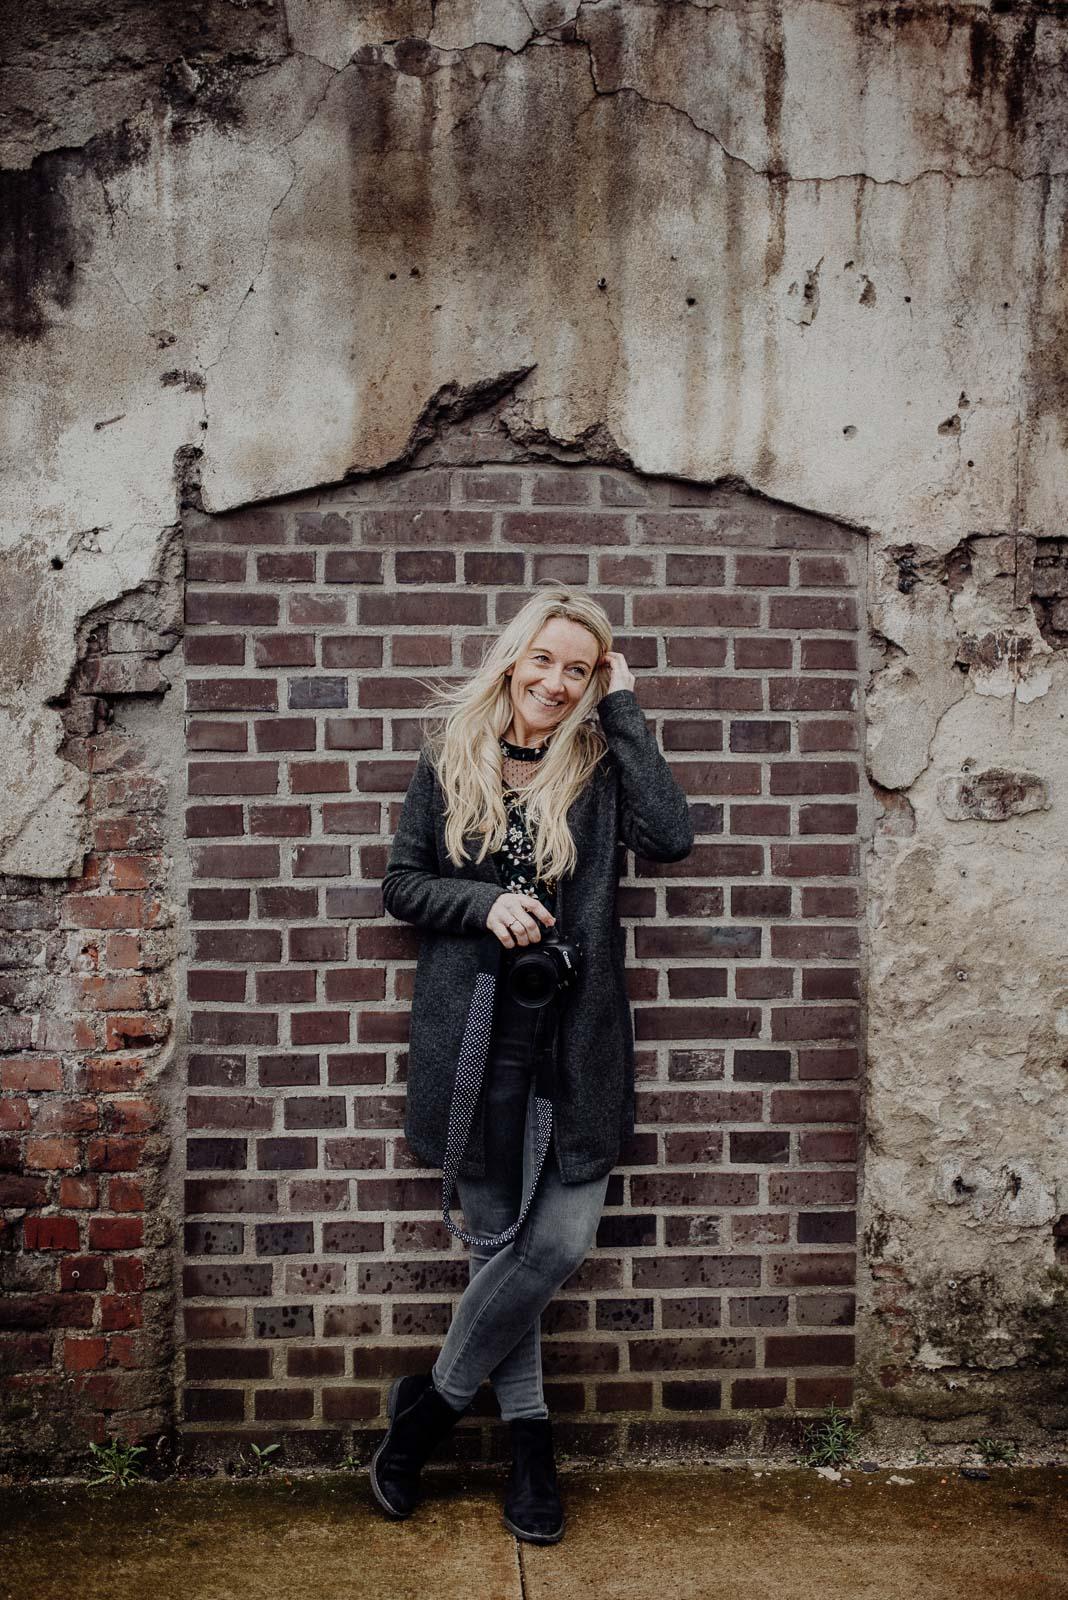 045-fotograf-witten-bochum-businessshooting-urban